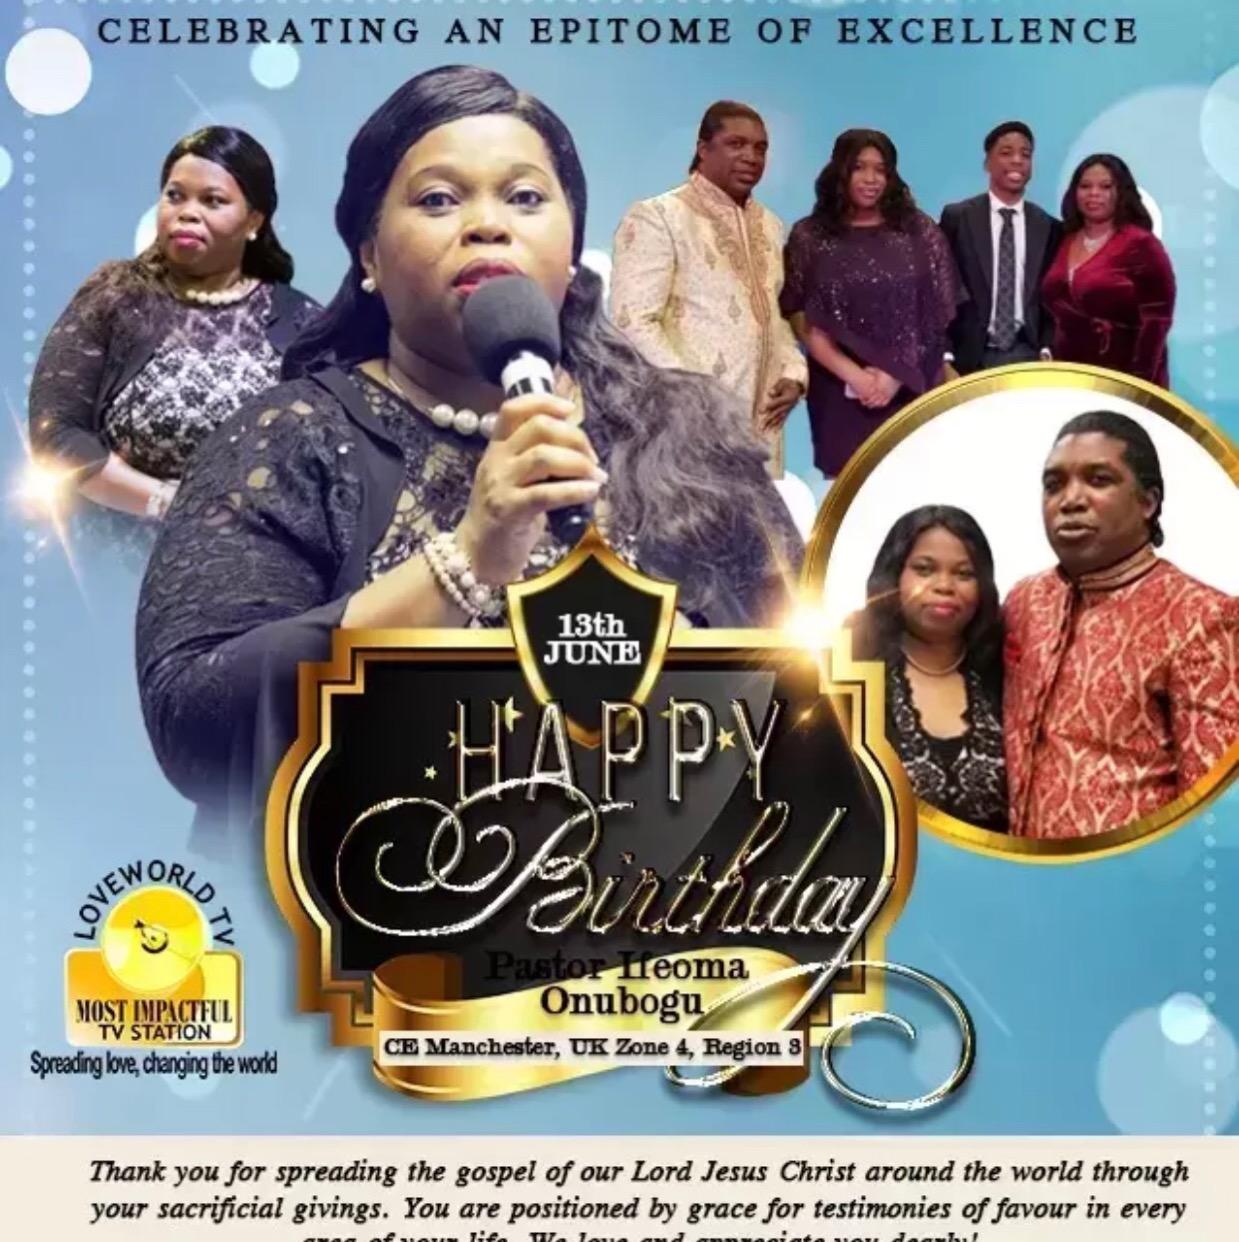 Happy birthday dear Pastor Ifeoma